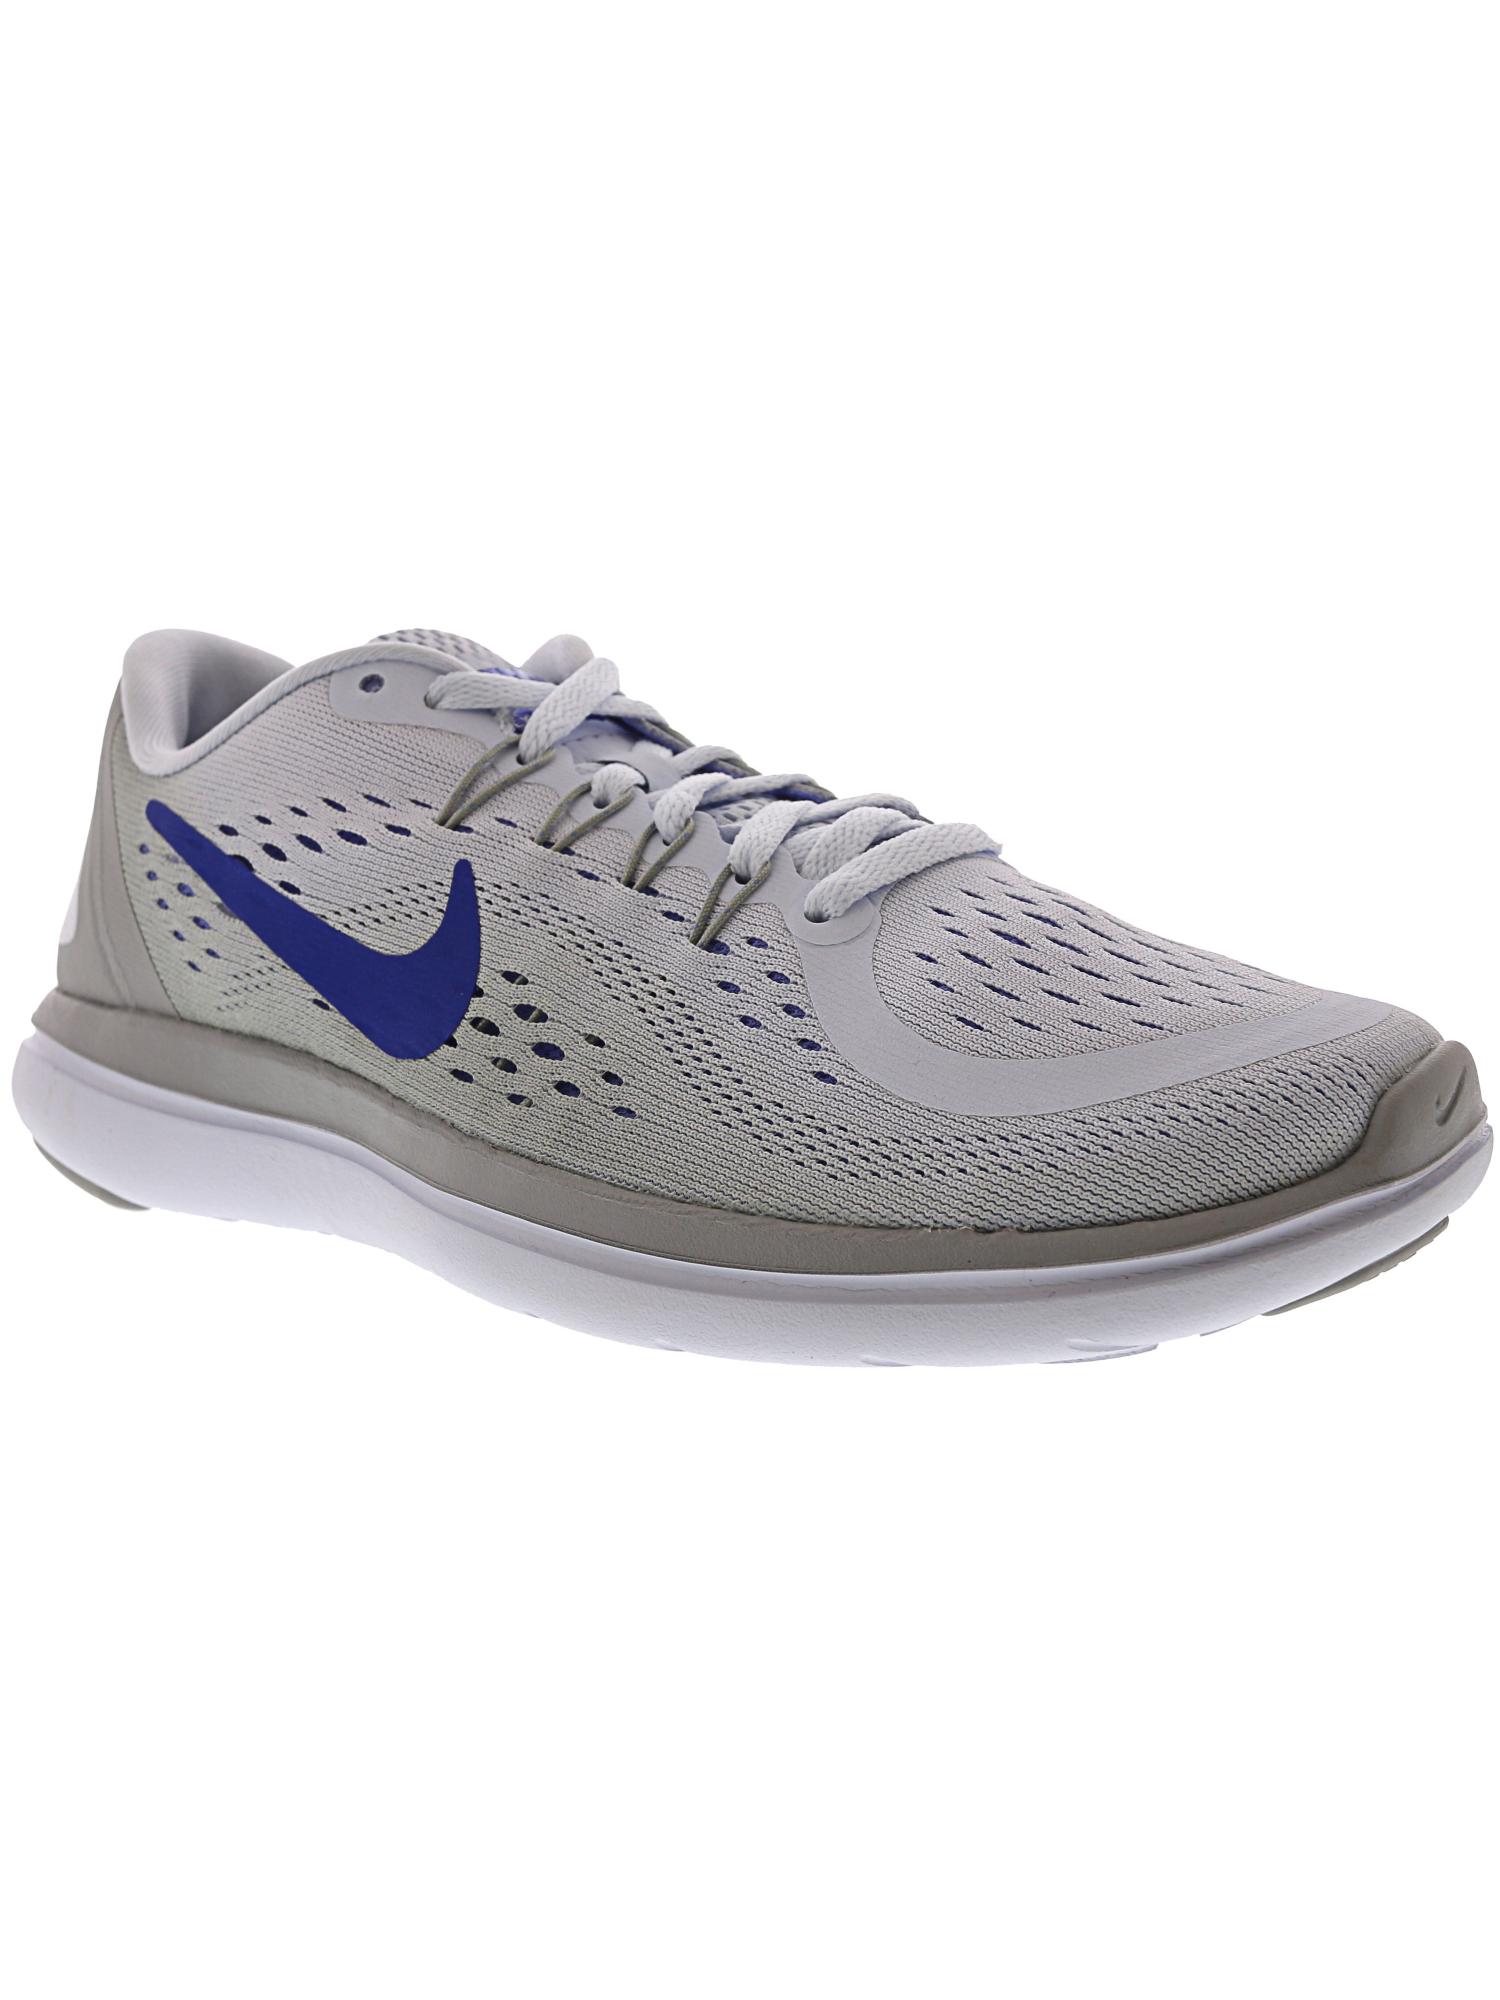 6f476f14f89 Nike Women s Flex 2017 Rn Ankle-High Cross Country Running Shoe